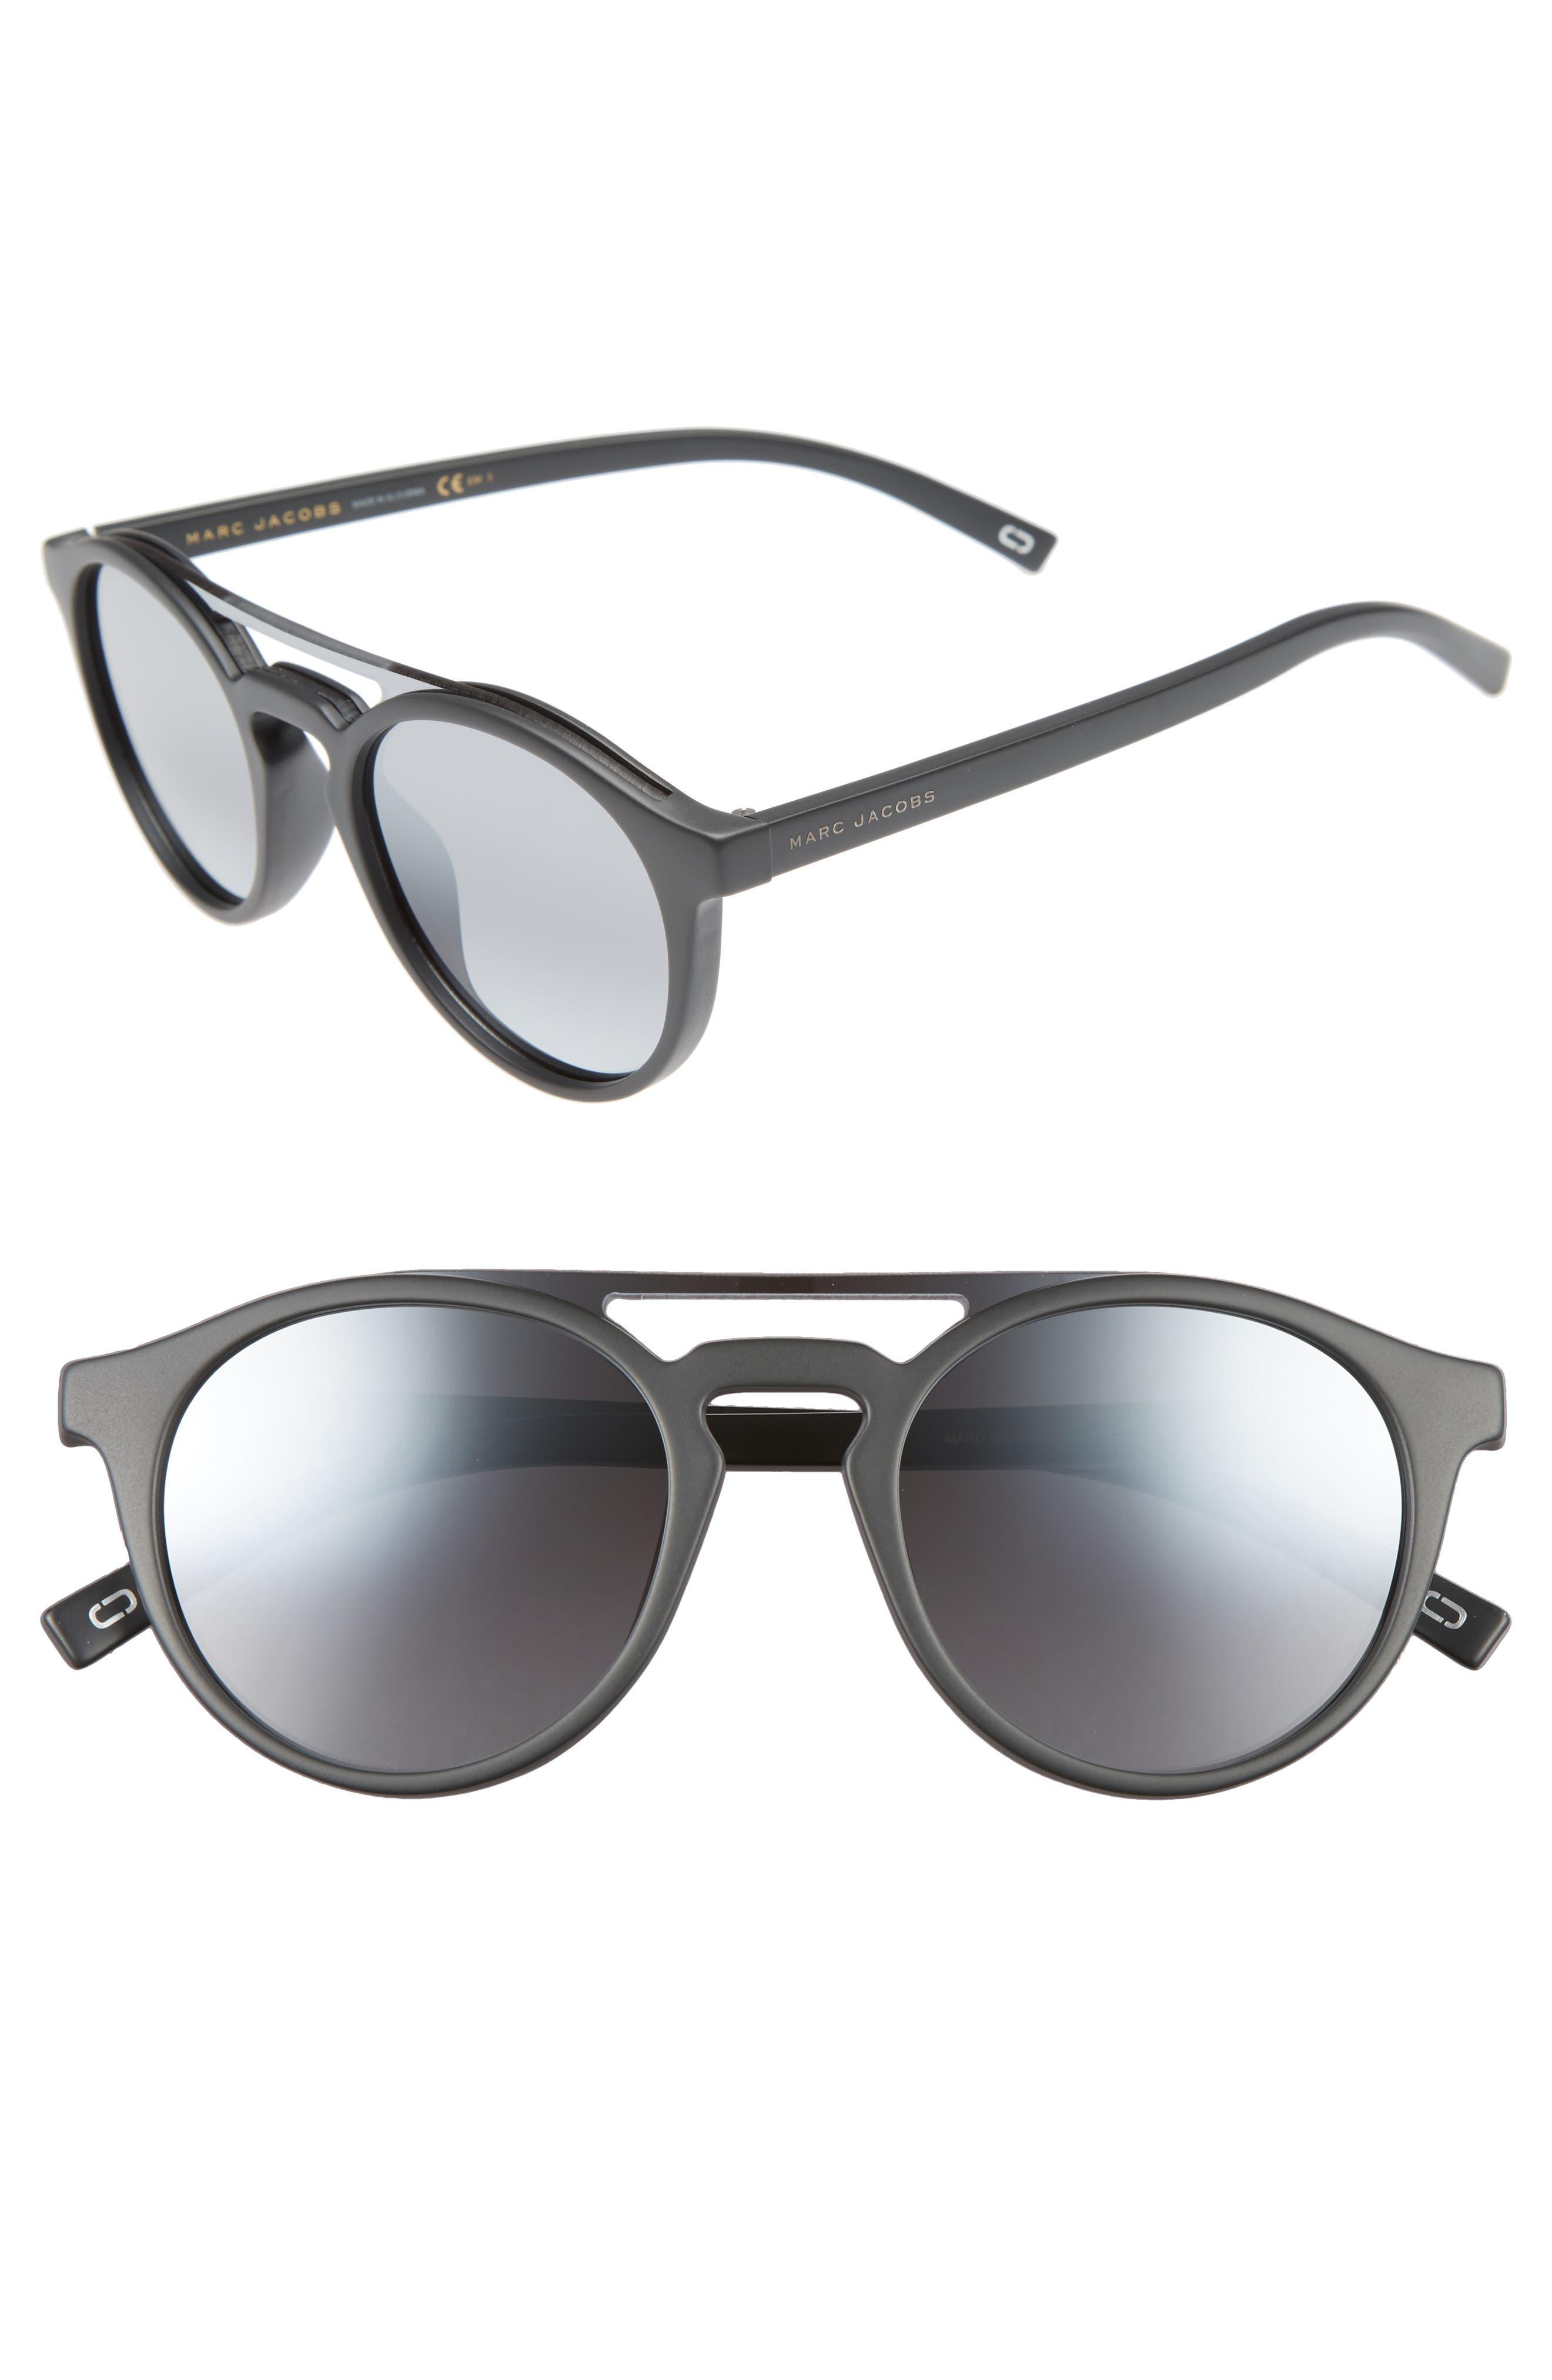 99mm Round Brow Bar Sunglasses,                         Main,                         color, Dark Grey